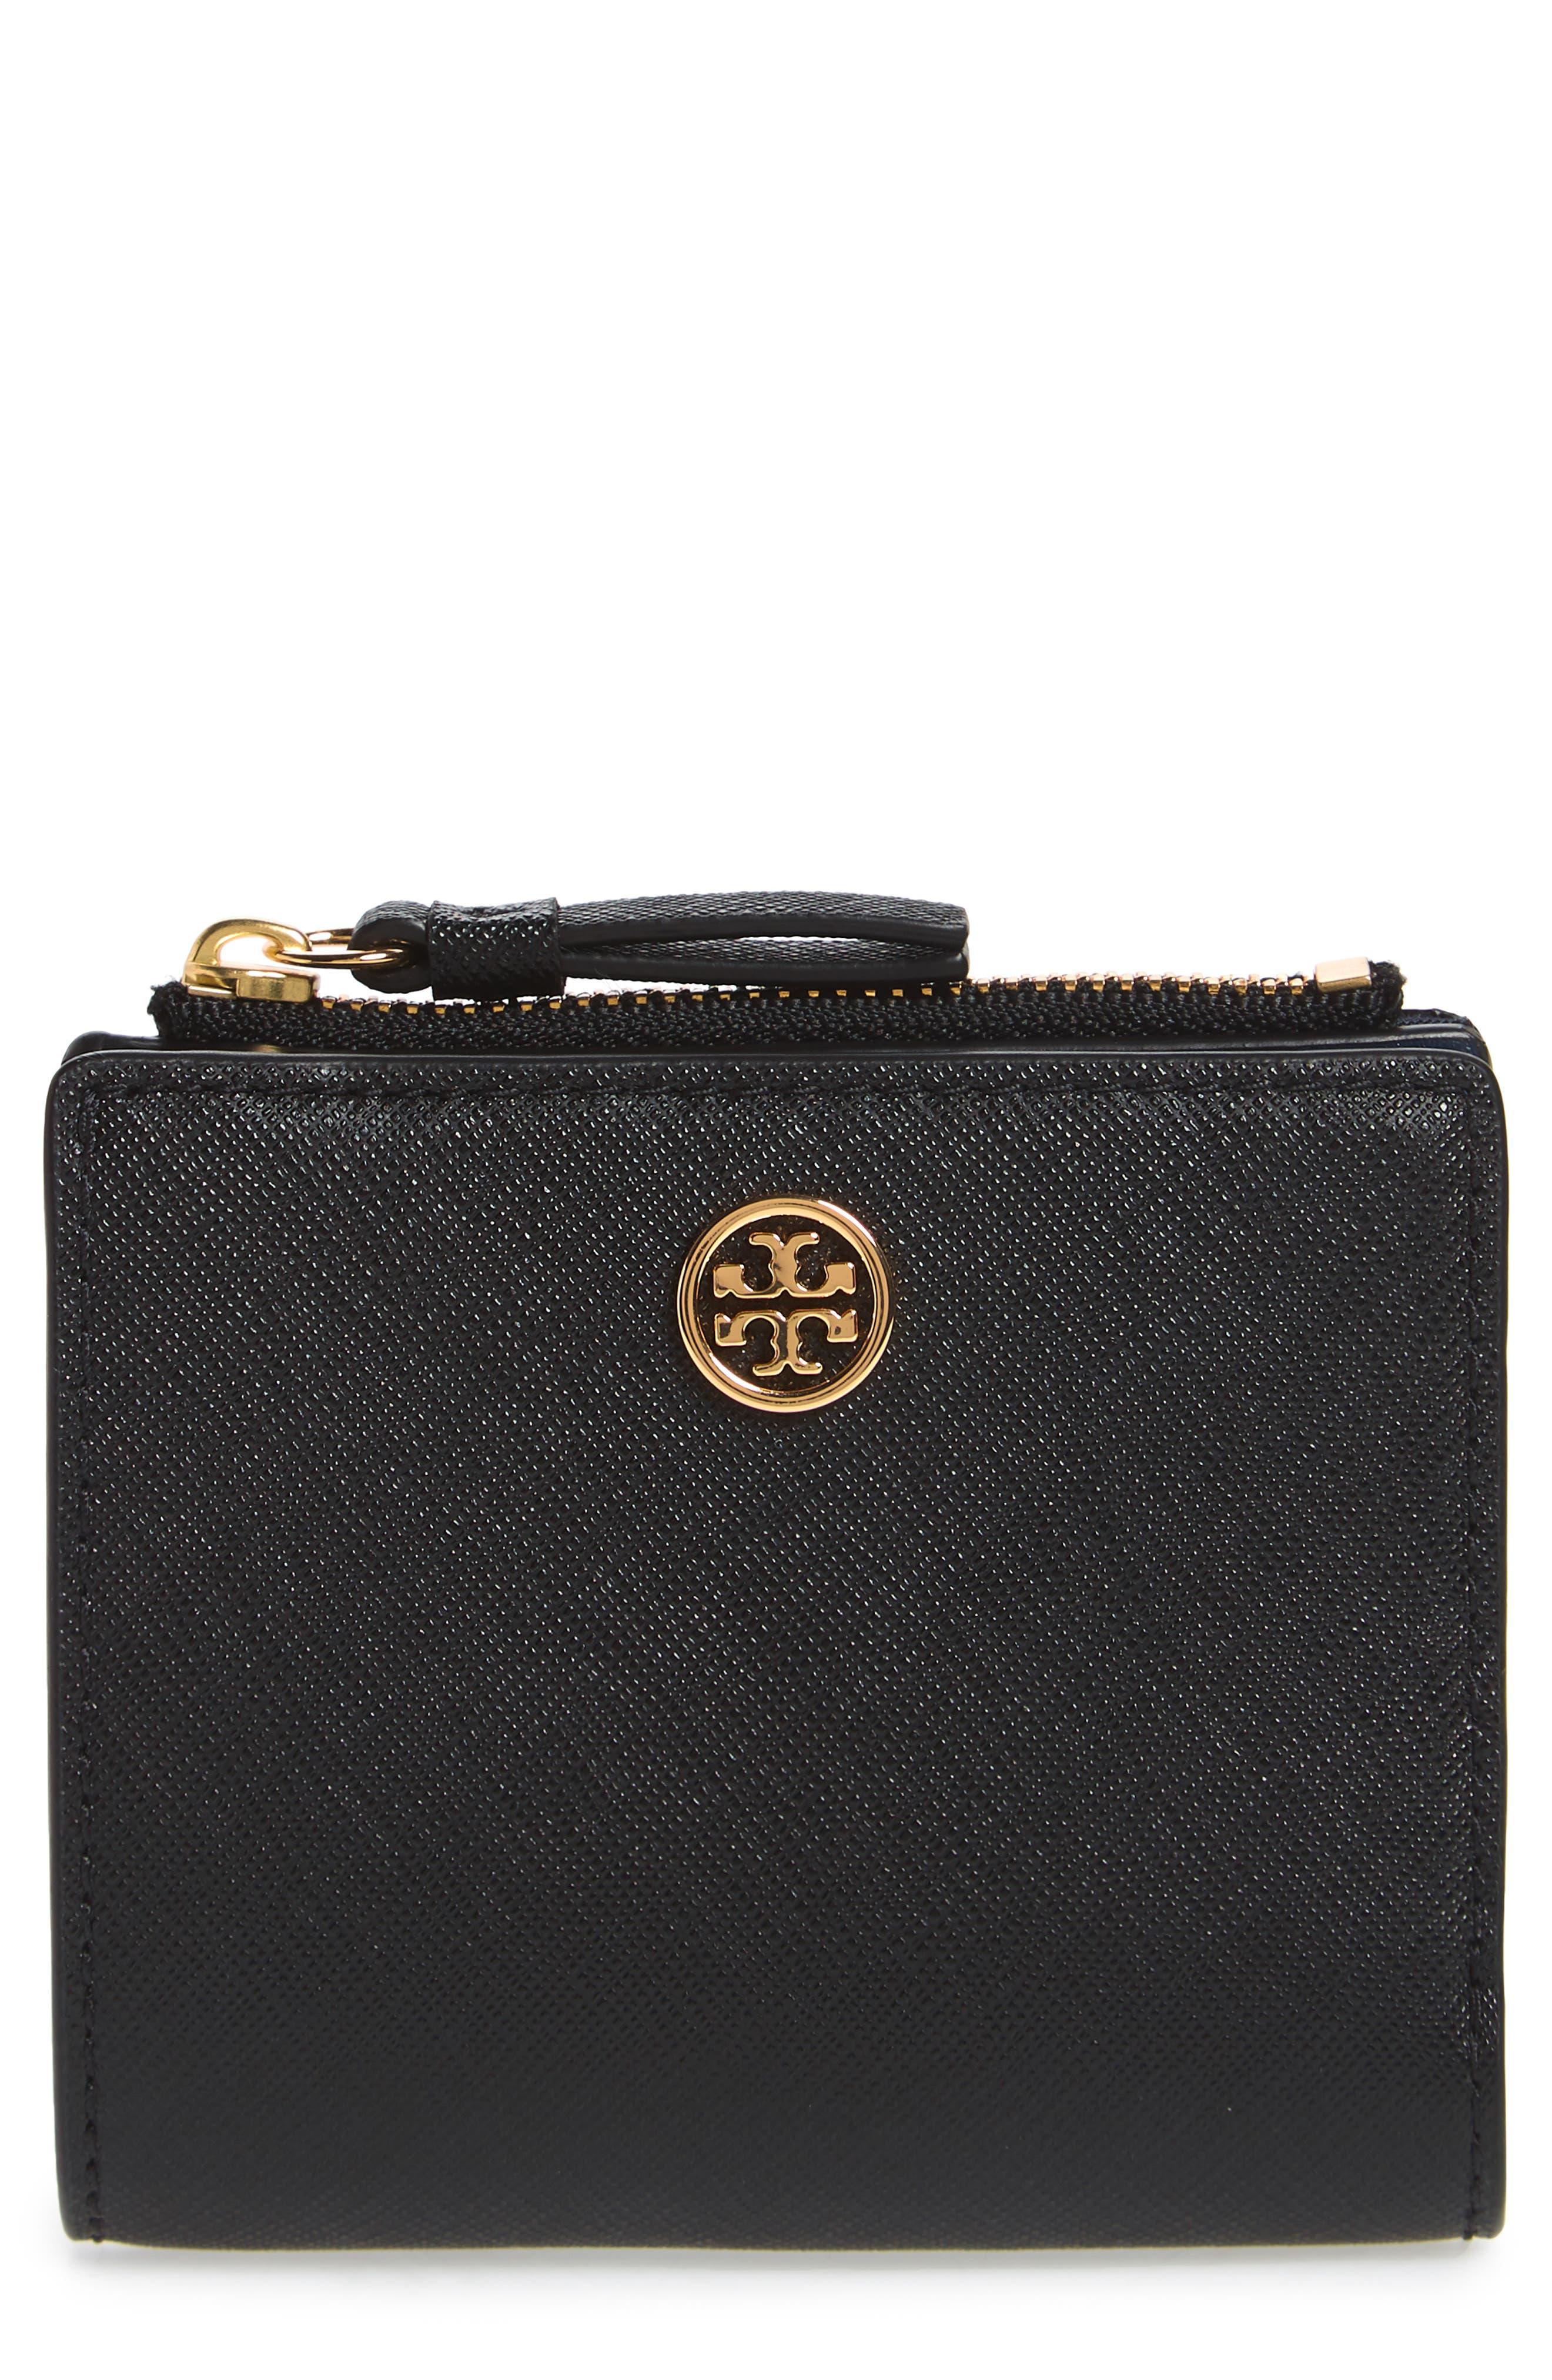 TORY BURCH,                             Mini Robinson Wallet Leather Bifold Wallet,                             Main thumbnail 1, color,                             BLACK / ROYAL NAVY